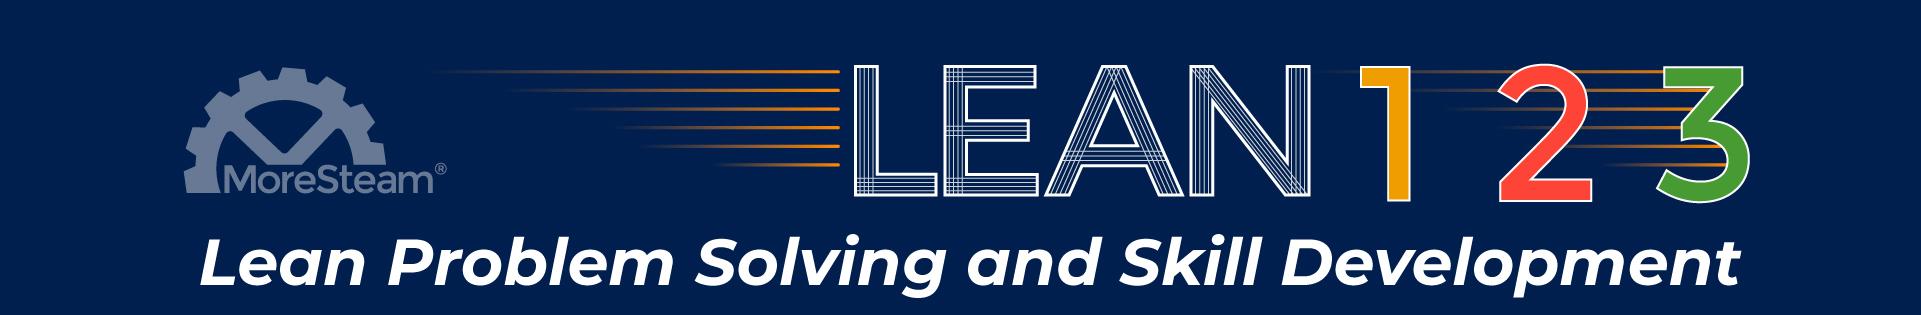 Lean 1-2-3: Lean Problem Solving and Skill Development